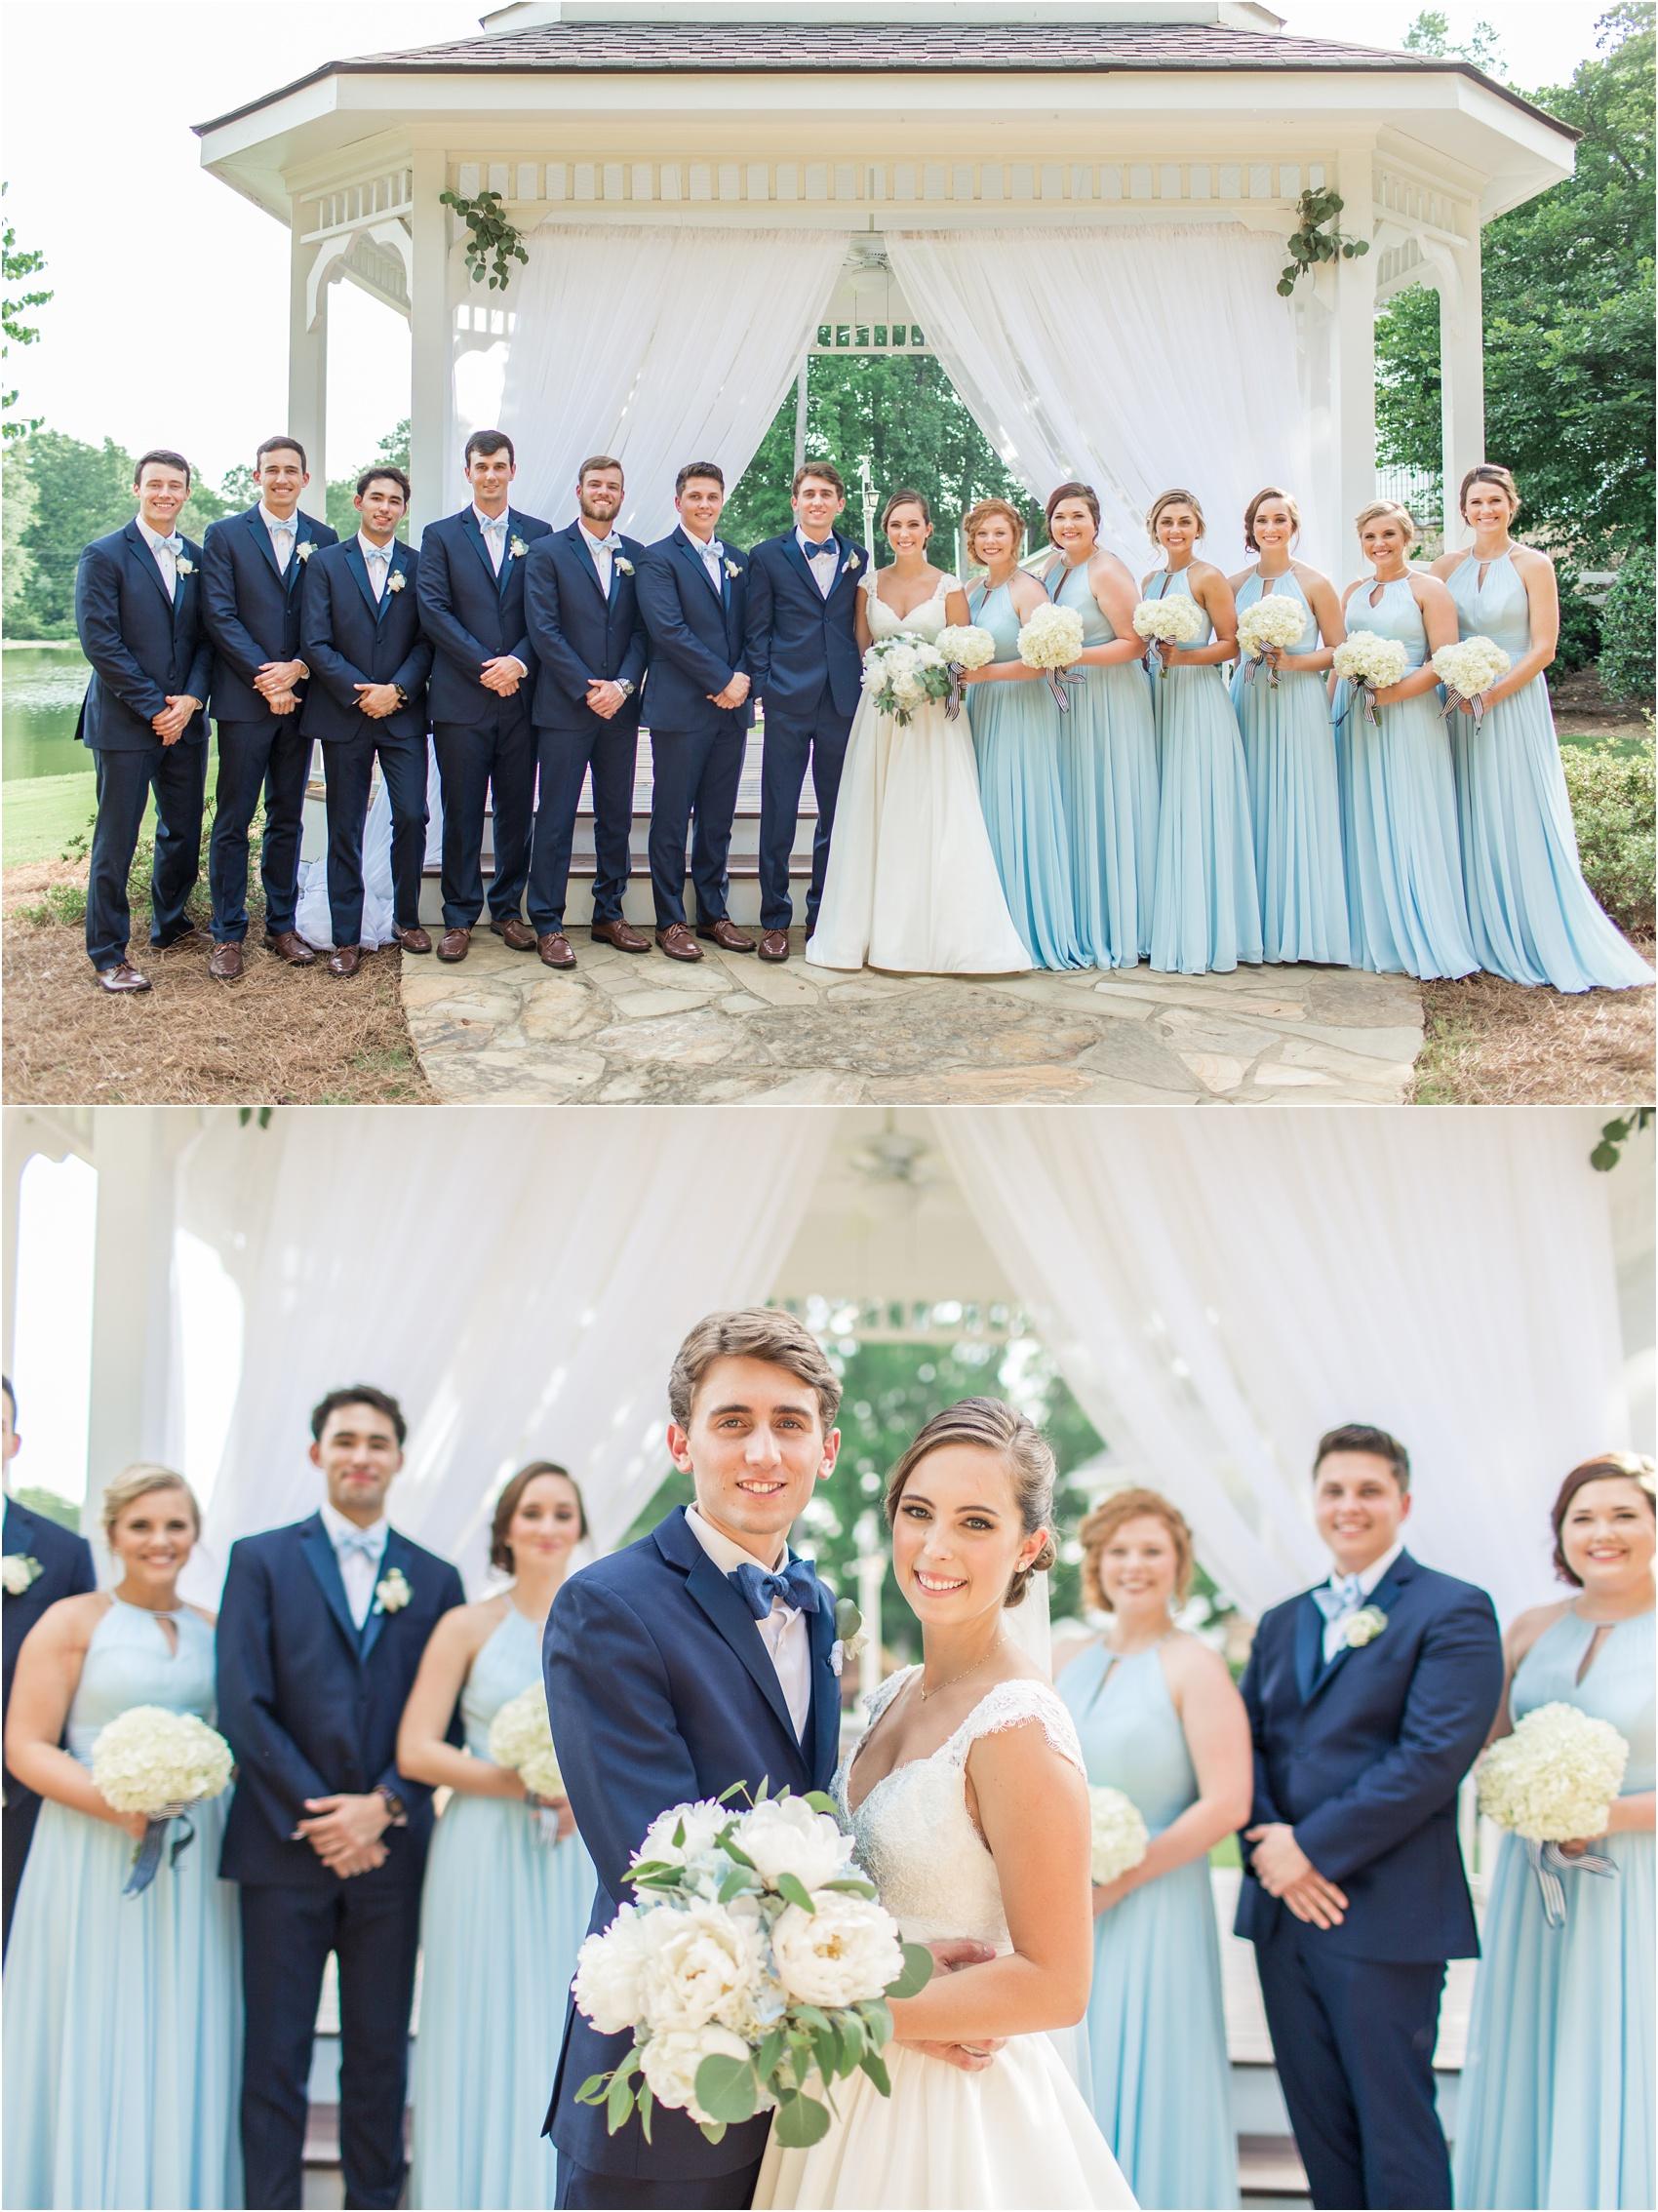 Savannah Eve Photography- Sigl-Adams Wedding- Sneak Peek-48.jpg